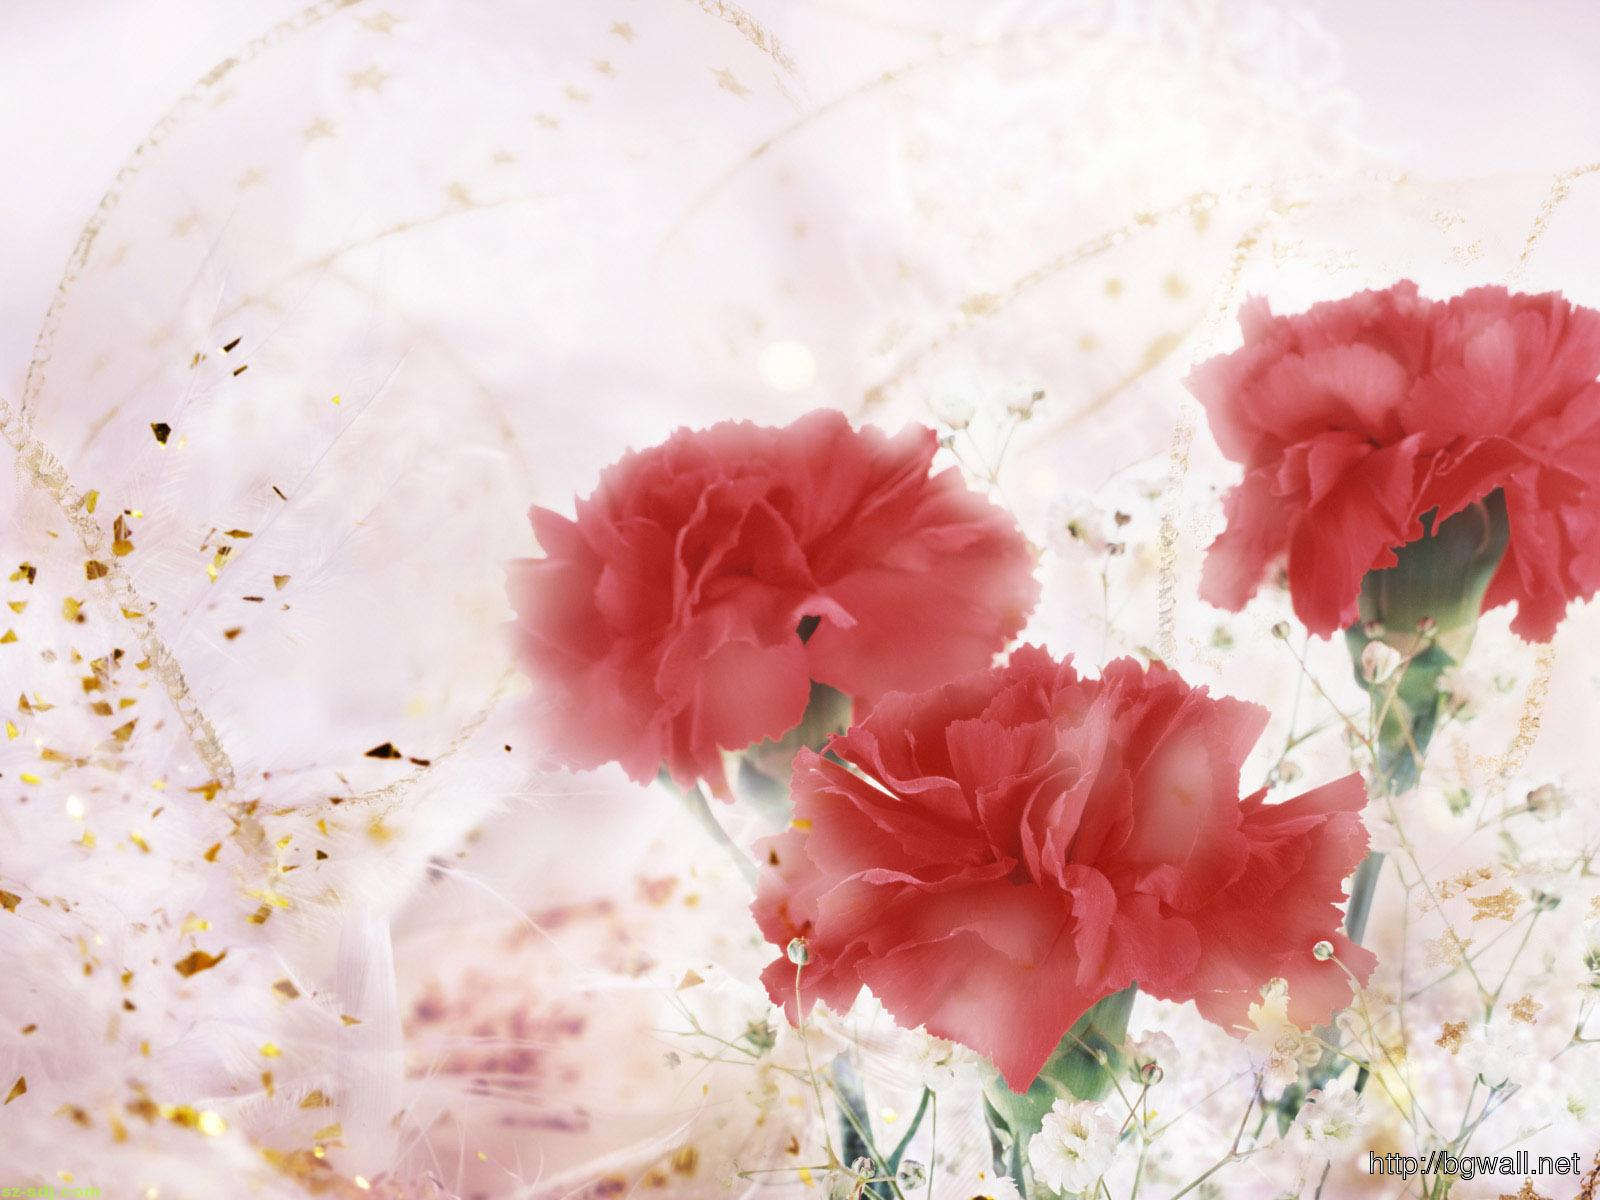 Art-Red-Flowers-Wallpaper